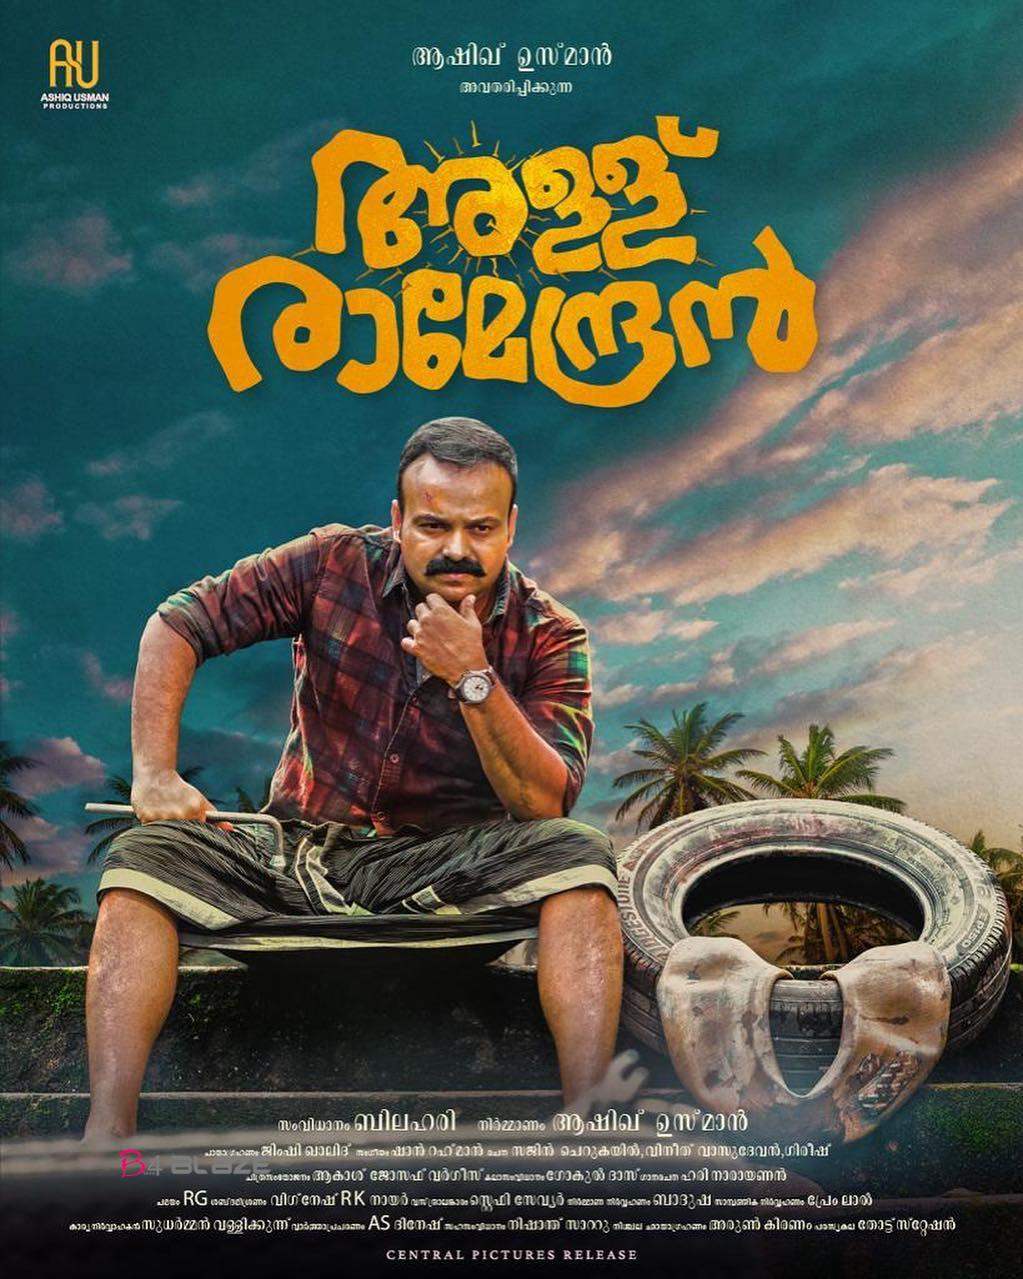 Kunchacko boban in and as Allu-Ramendran movie poster